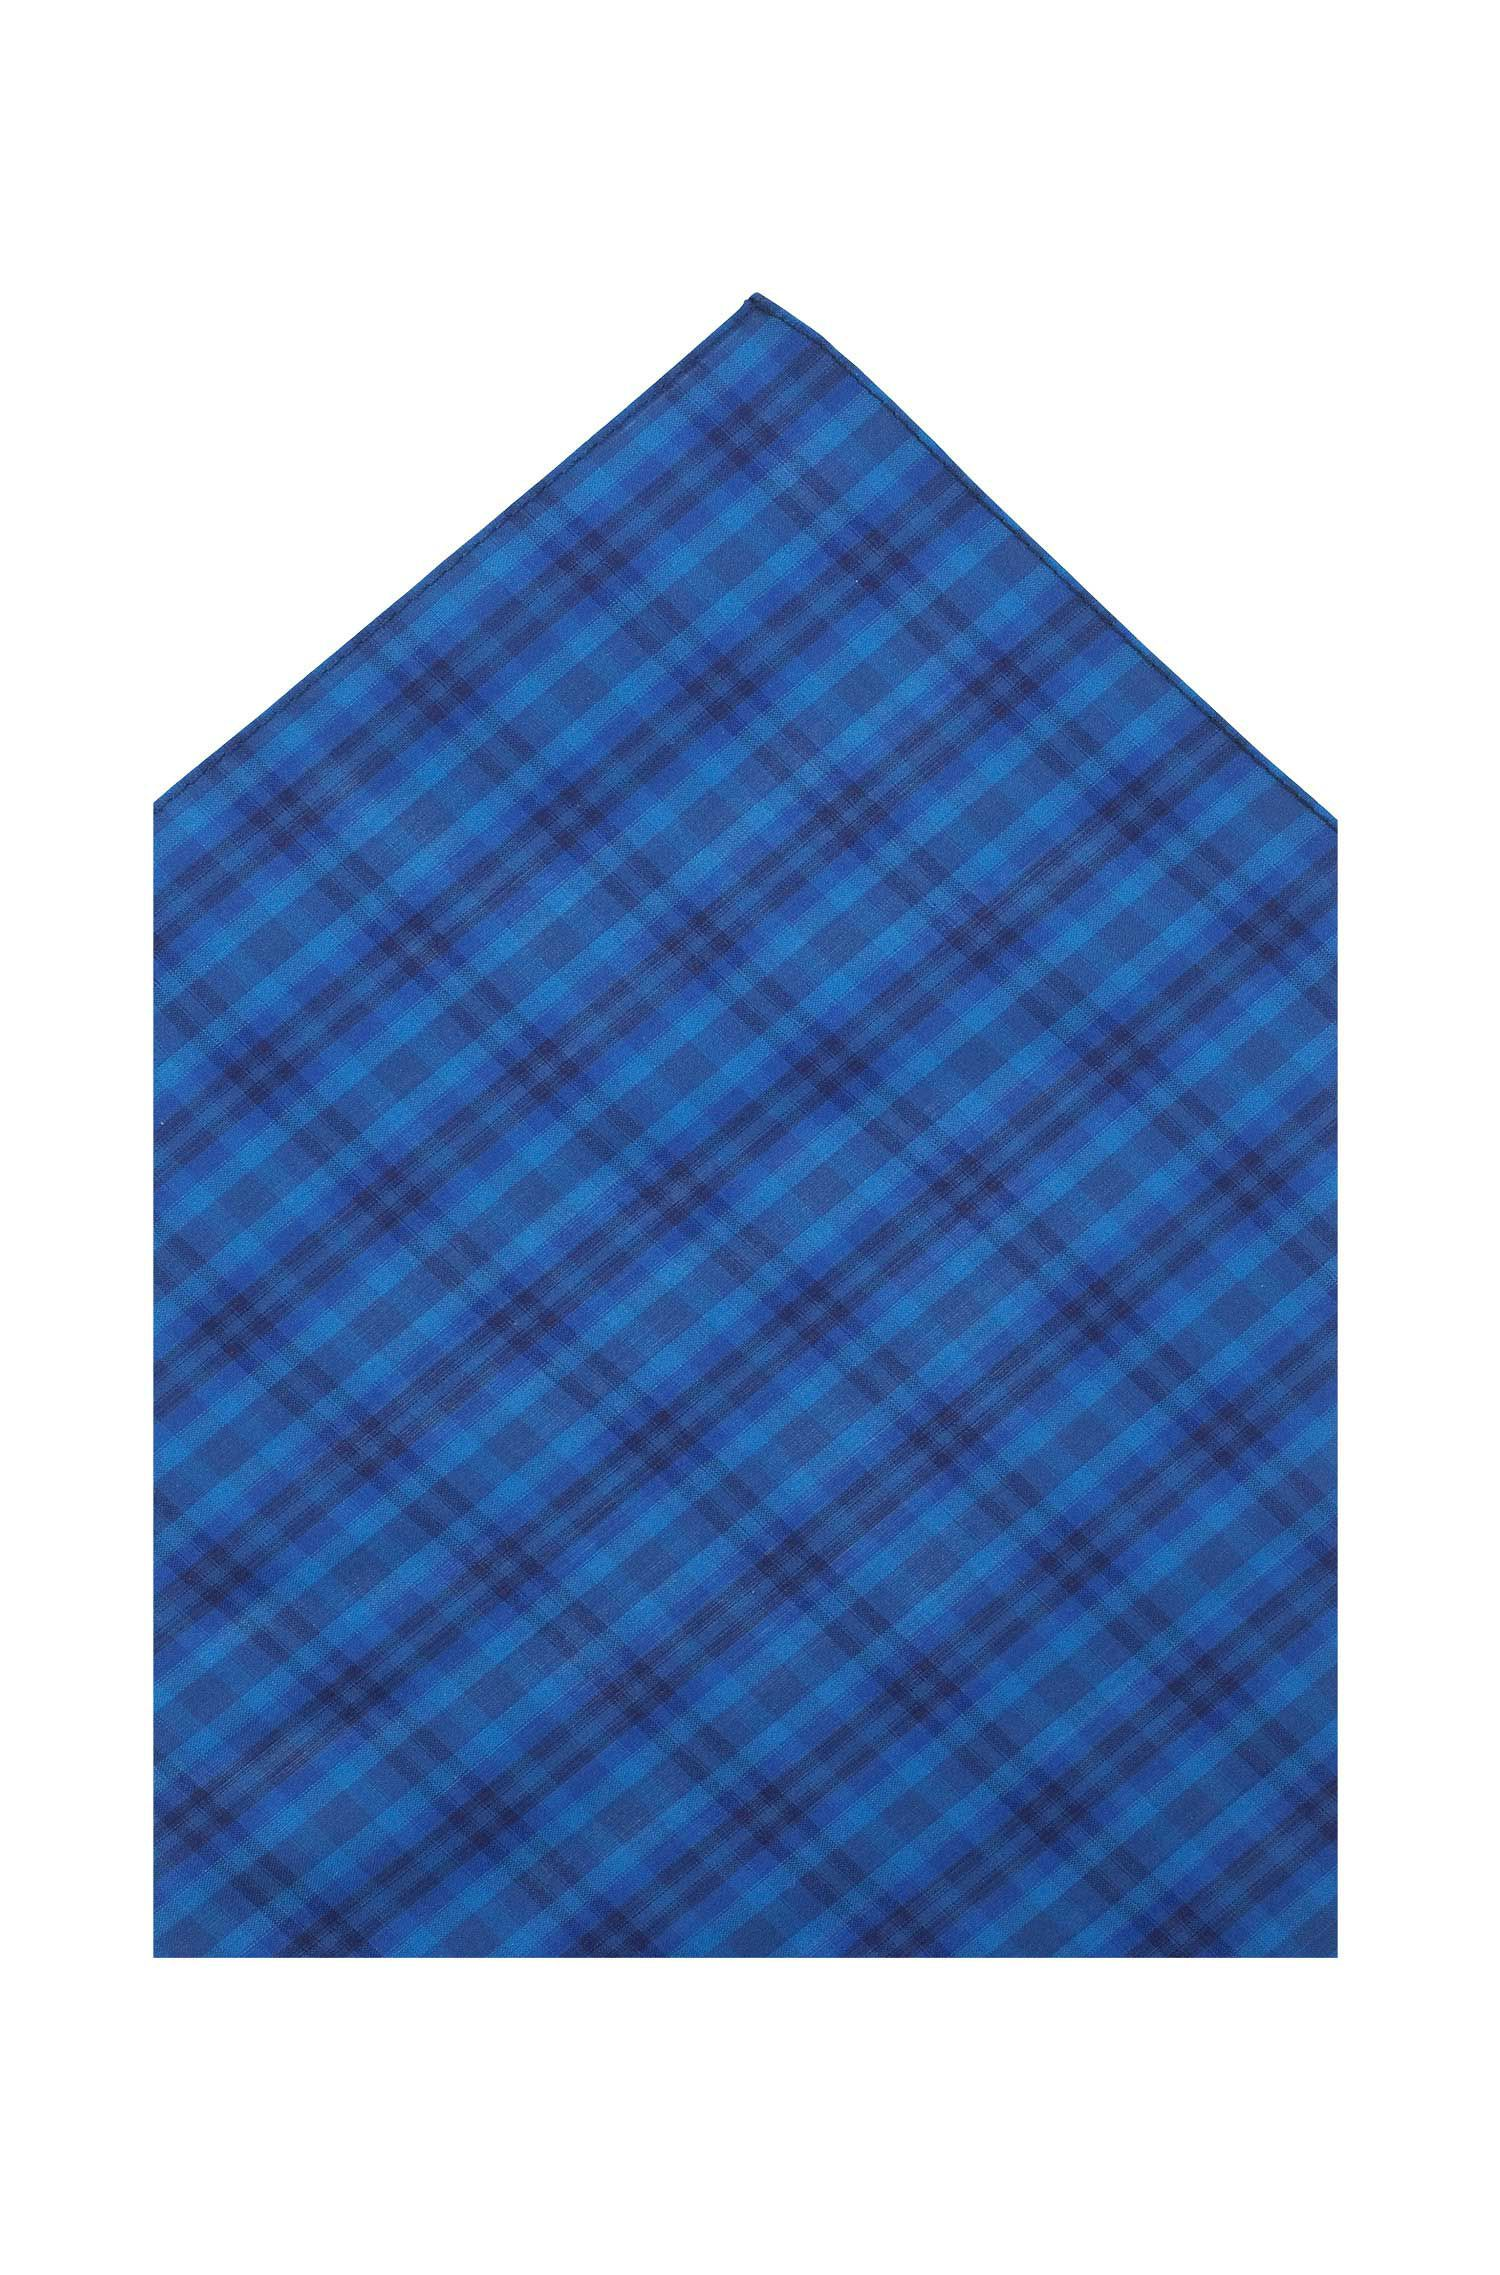 Pochet ´Pocket square 35 x 35` van katoen